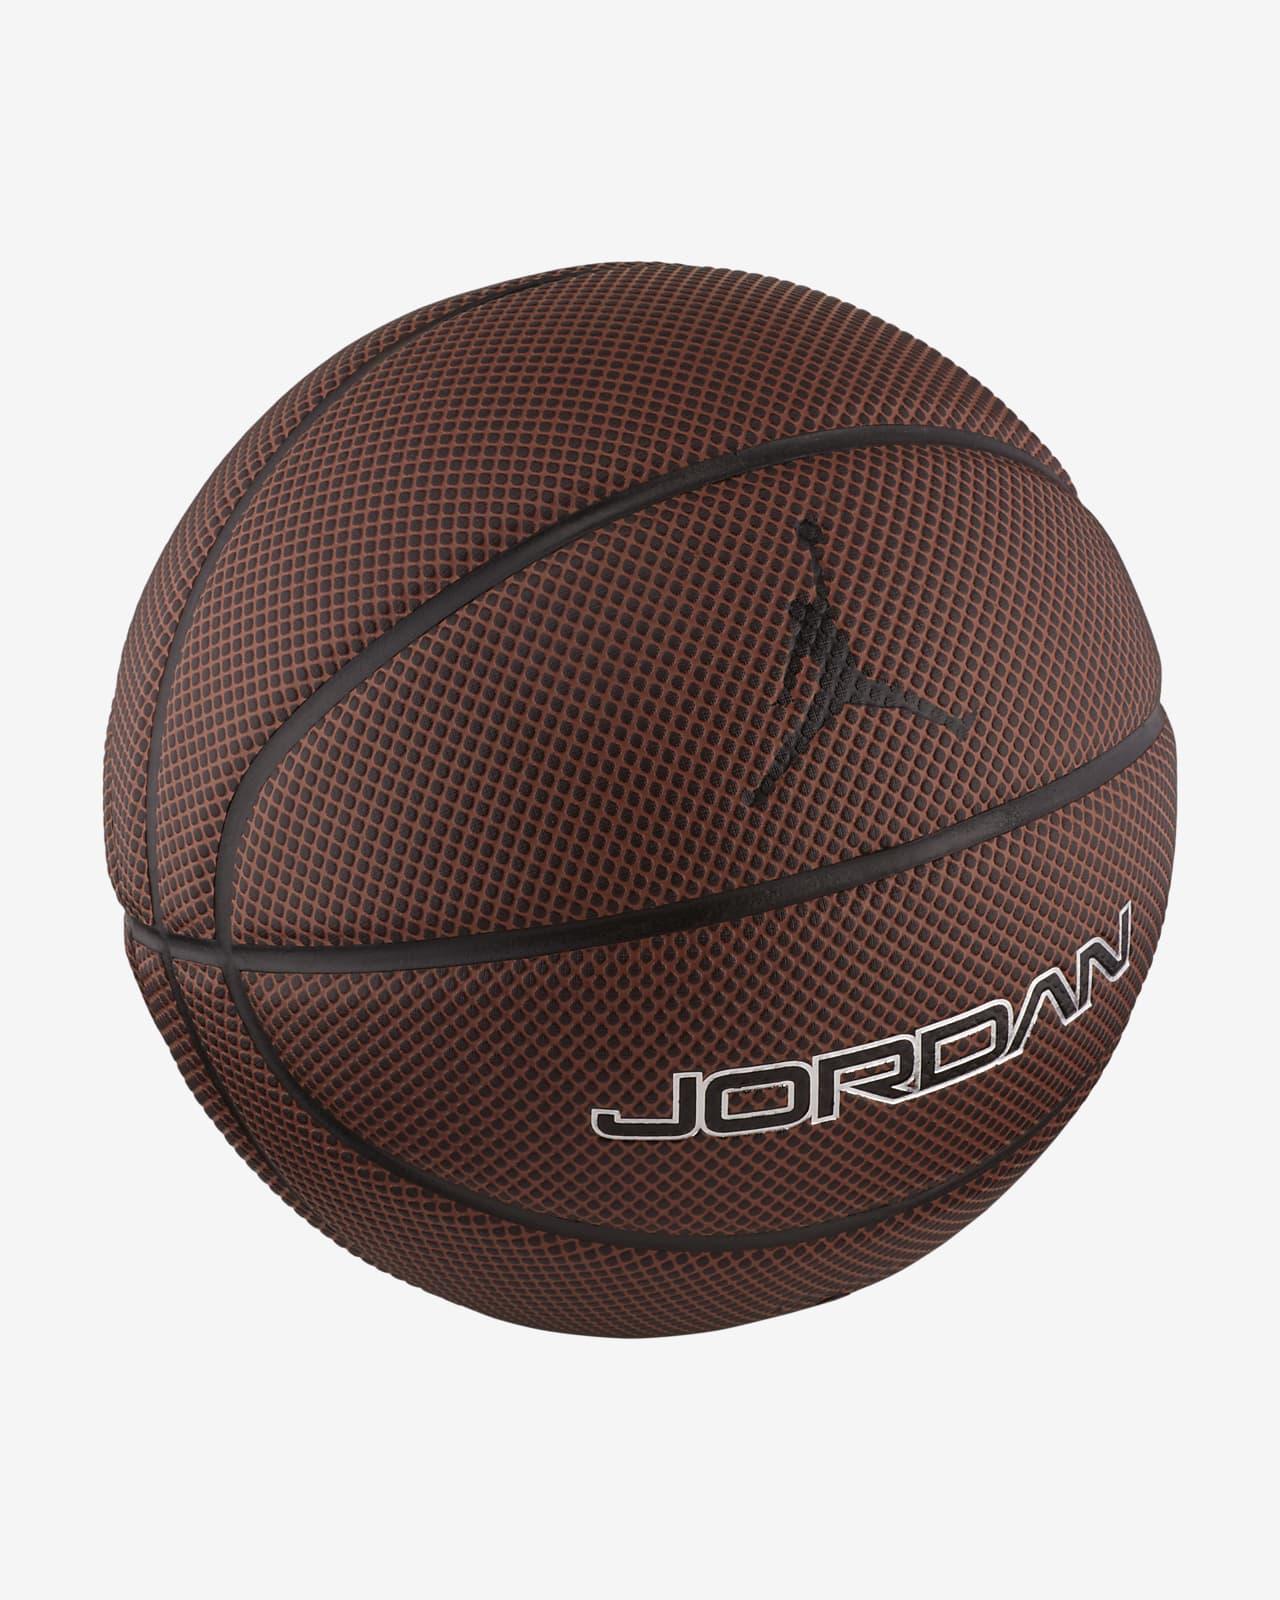 puramente Planificado Es decir  Jordan Legacy 8P (Size 7) Basketball. Nike VN